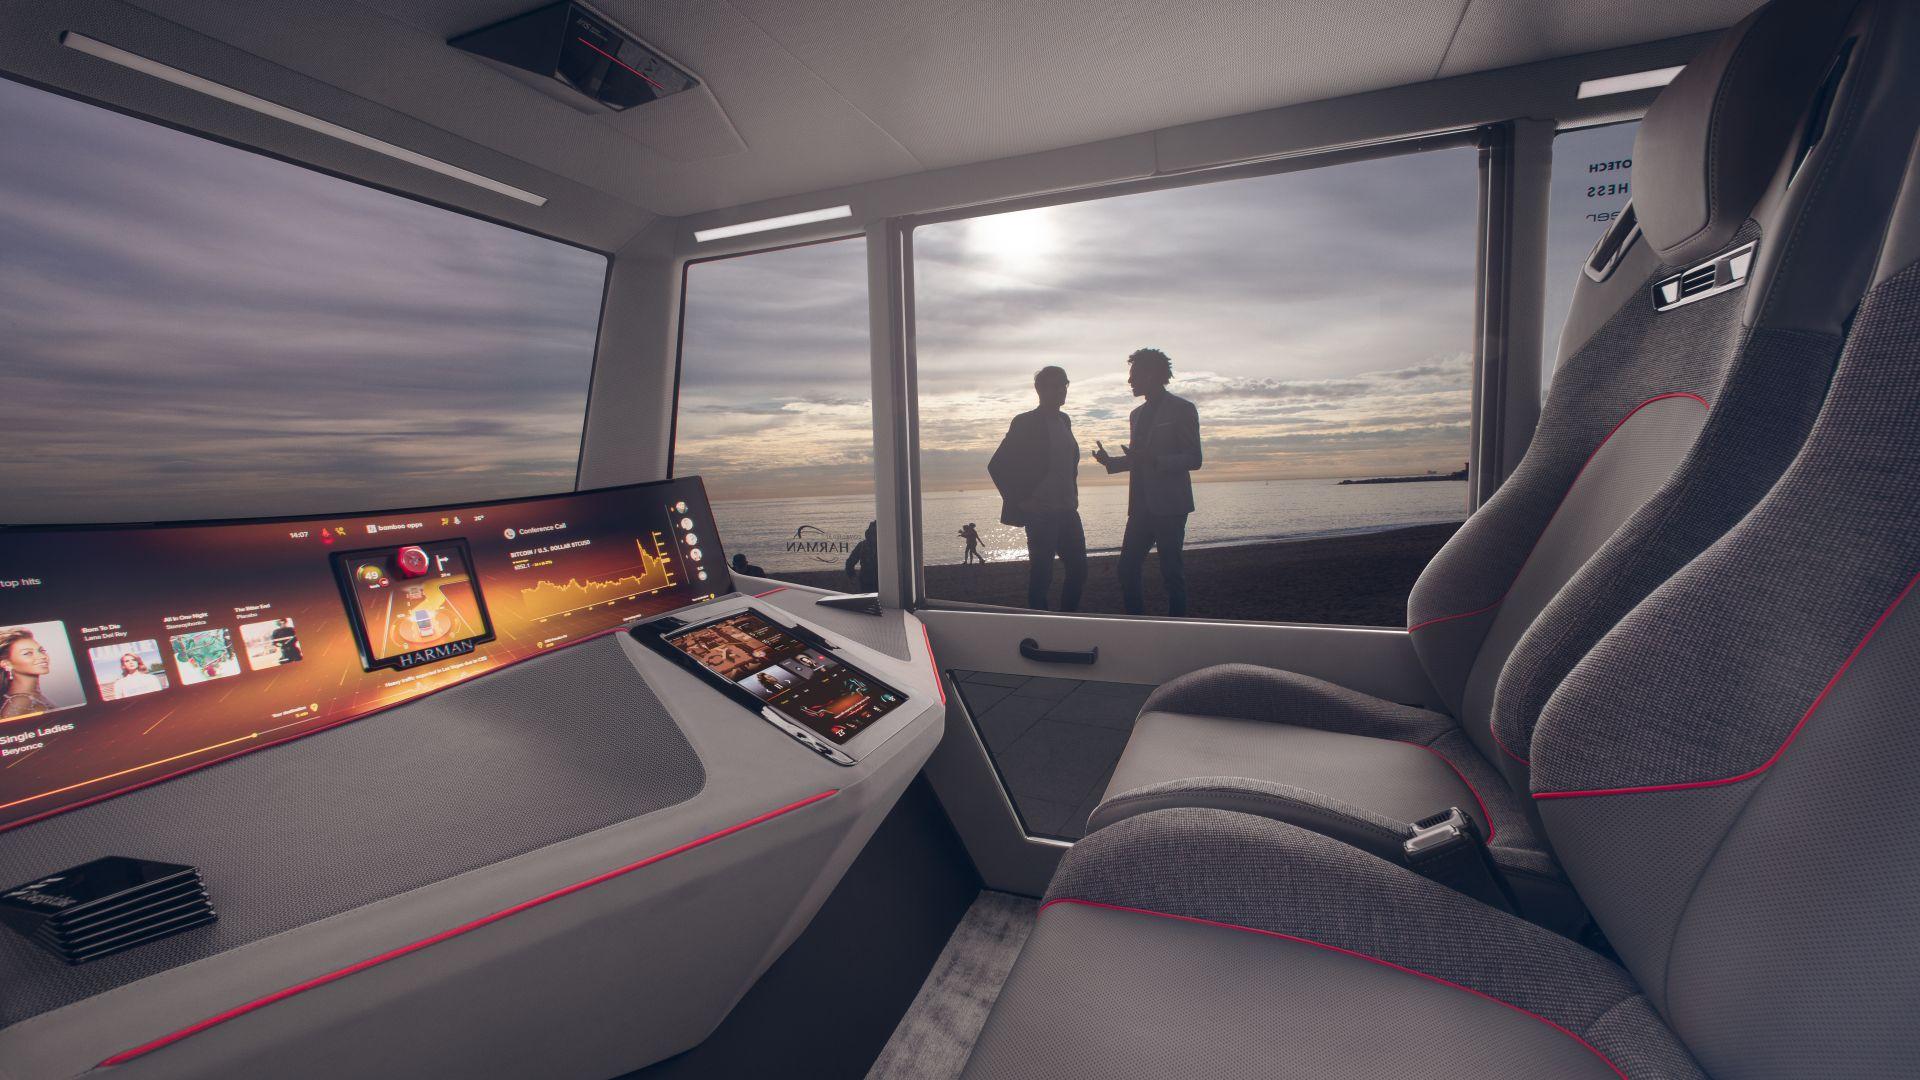 Auto Transport Quotes >> Wallpaper Rinspeed microSNAP, interior, 8K, Hi-Tech #21000